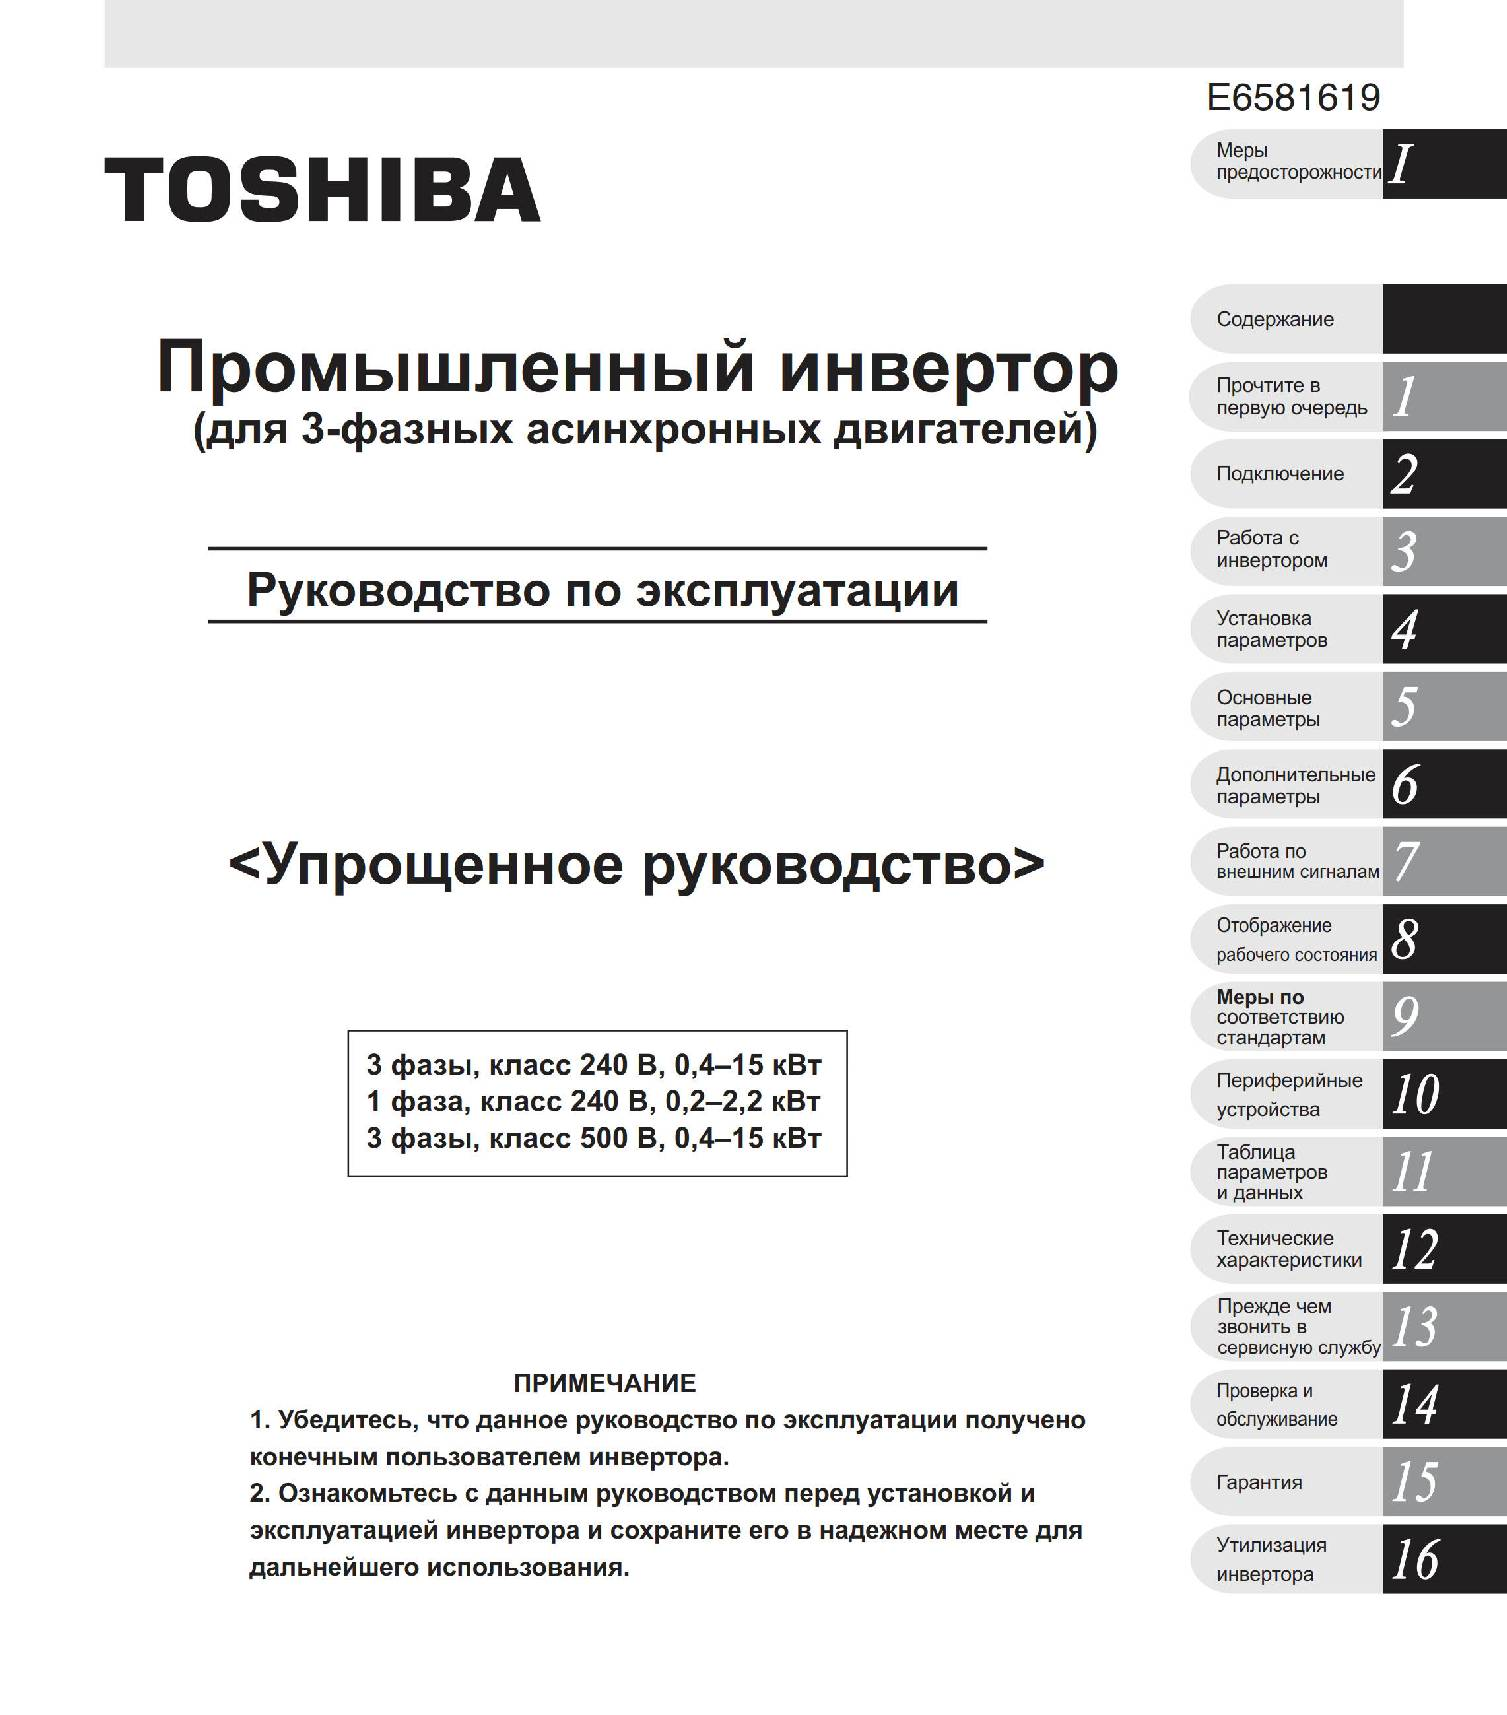 Руководство по эксплуатации частотника VF-S15 на русском языке E6581619